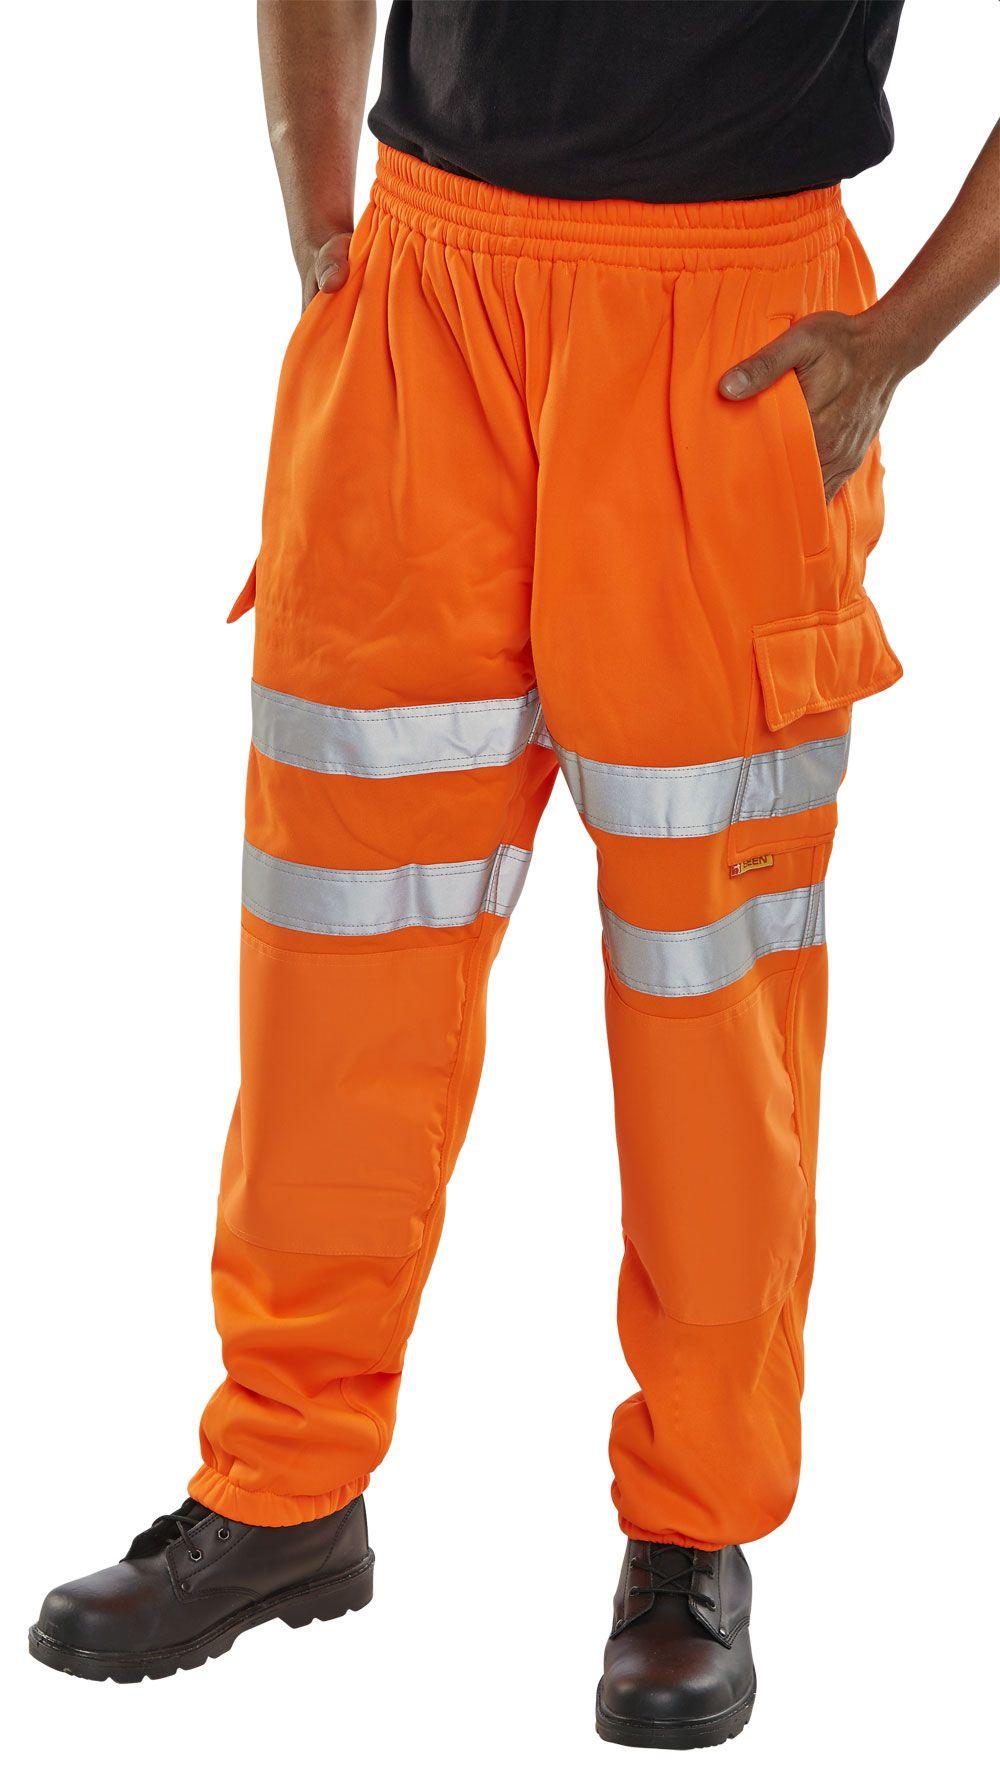 B-Seen Hi-Vis Railway Jogging Bottoms Trousers Orange